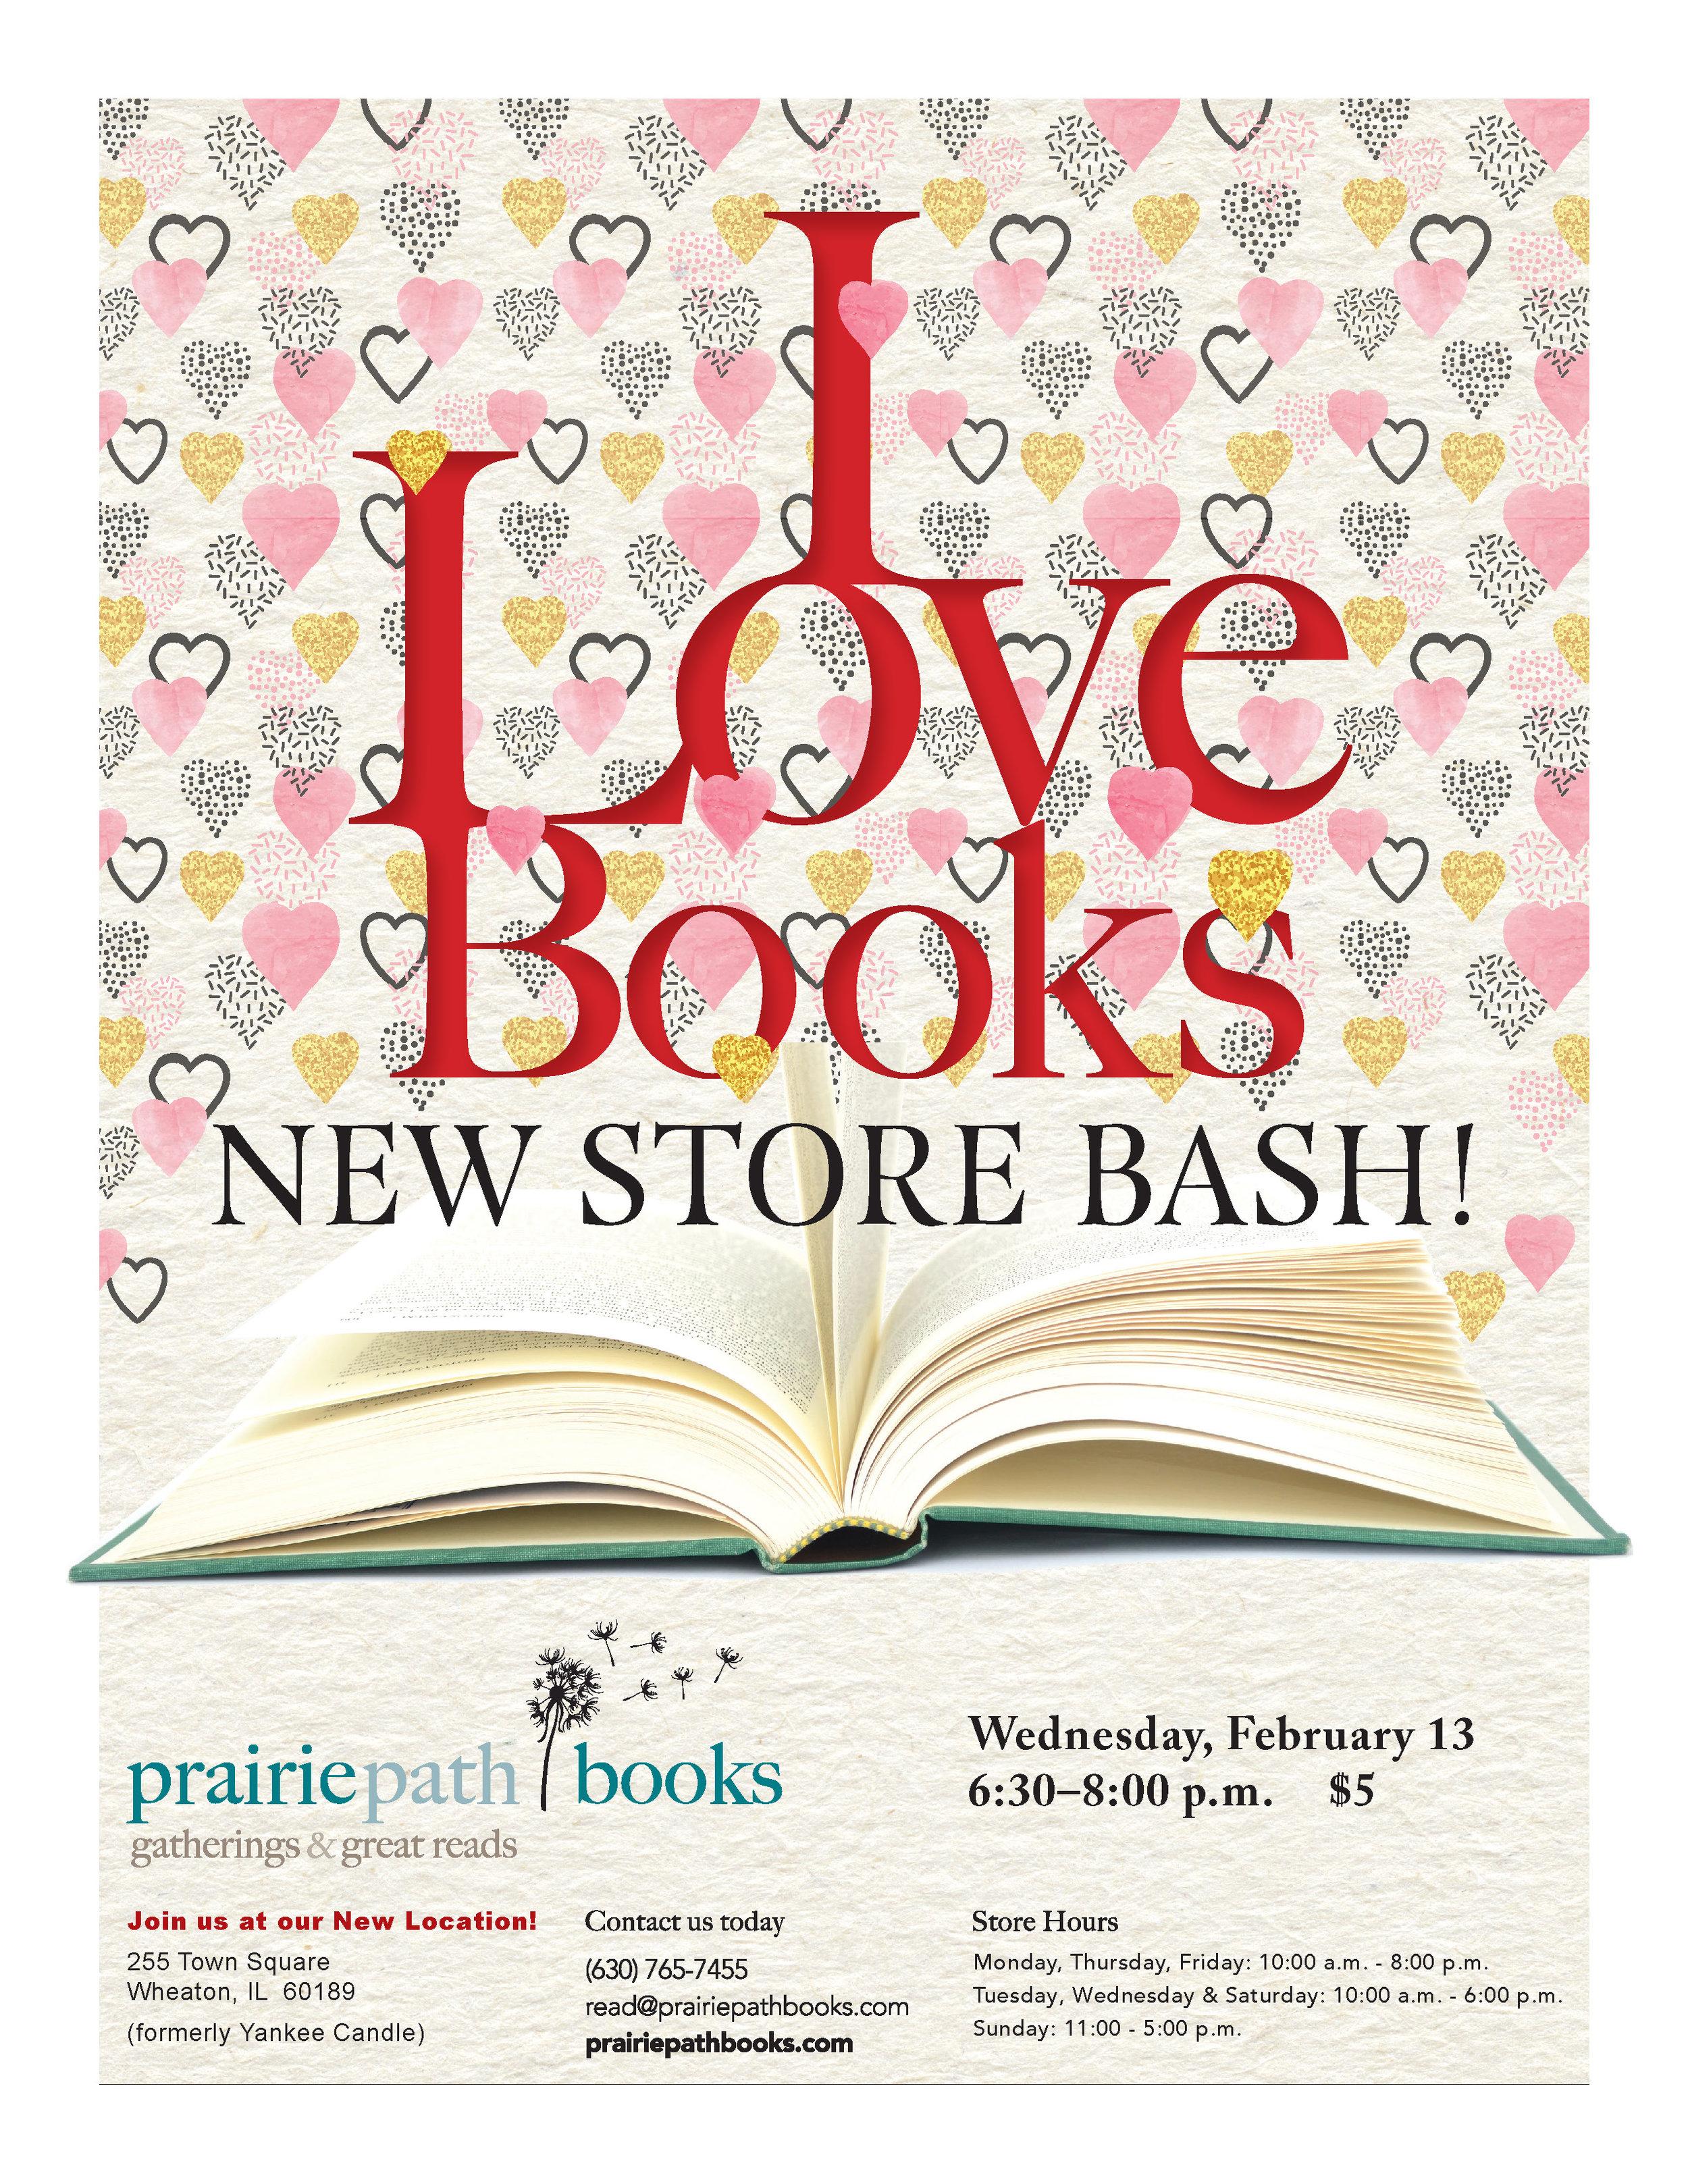 ILoveBooks_NewStoreBash.jpg